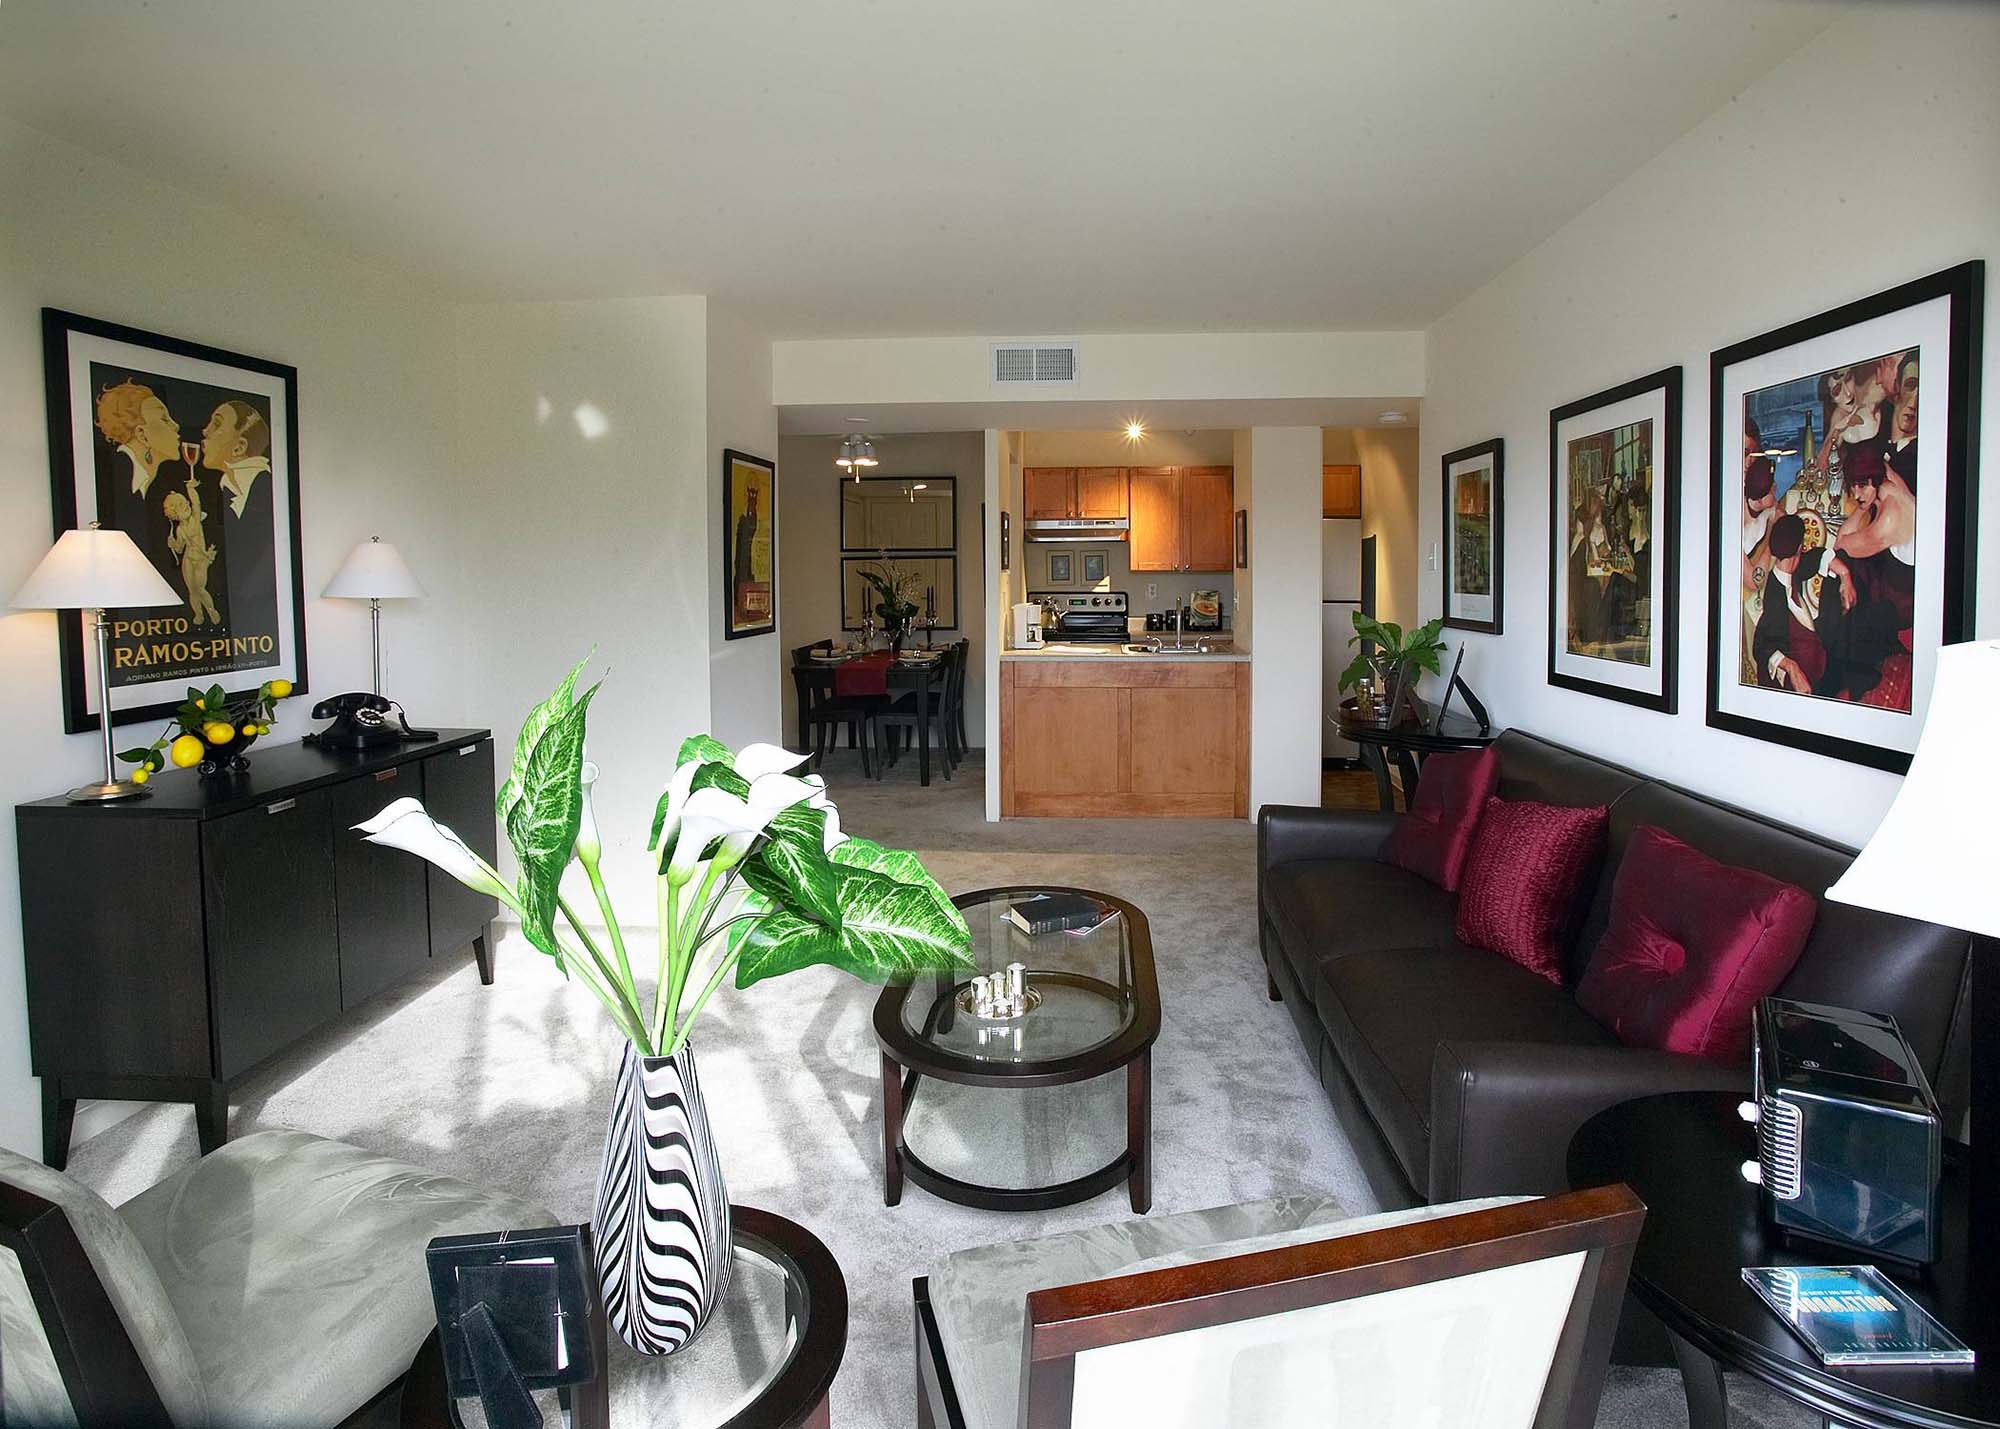 Pavilion-1 bedroom livingroom- pic